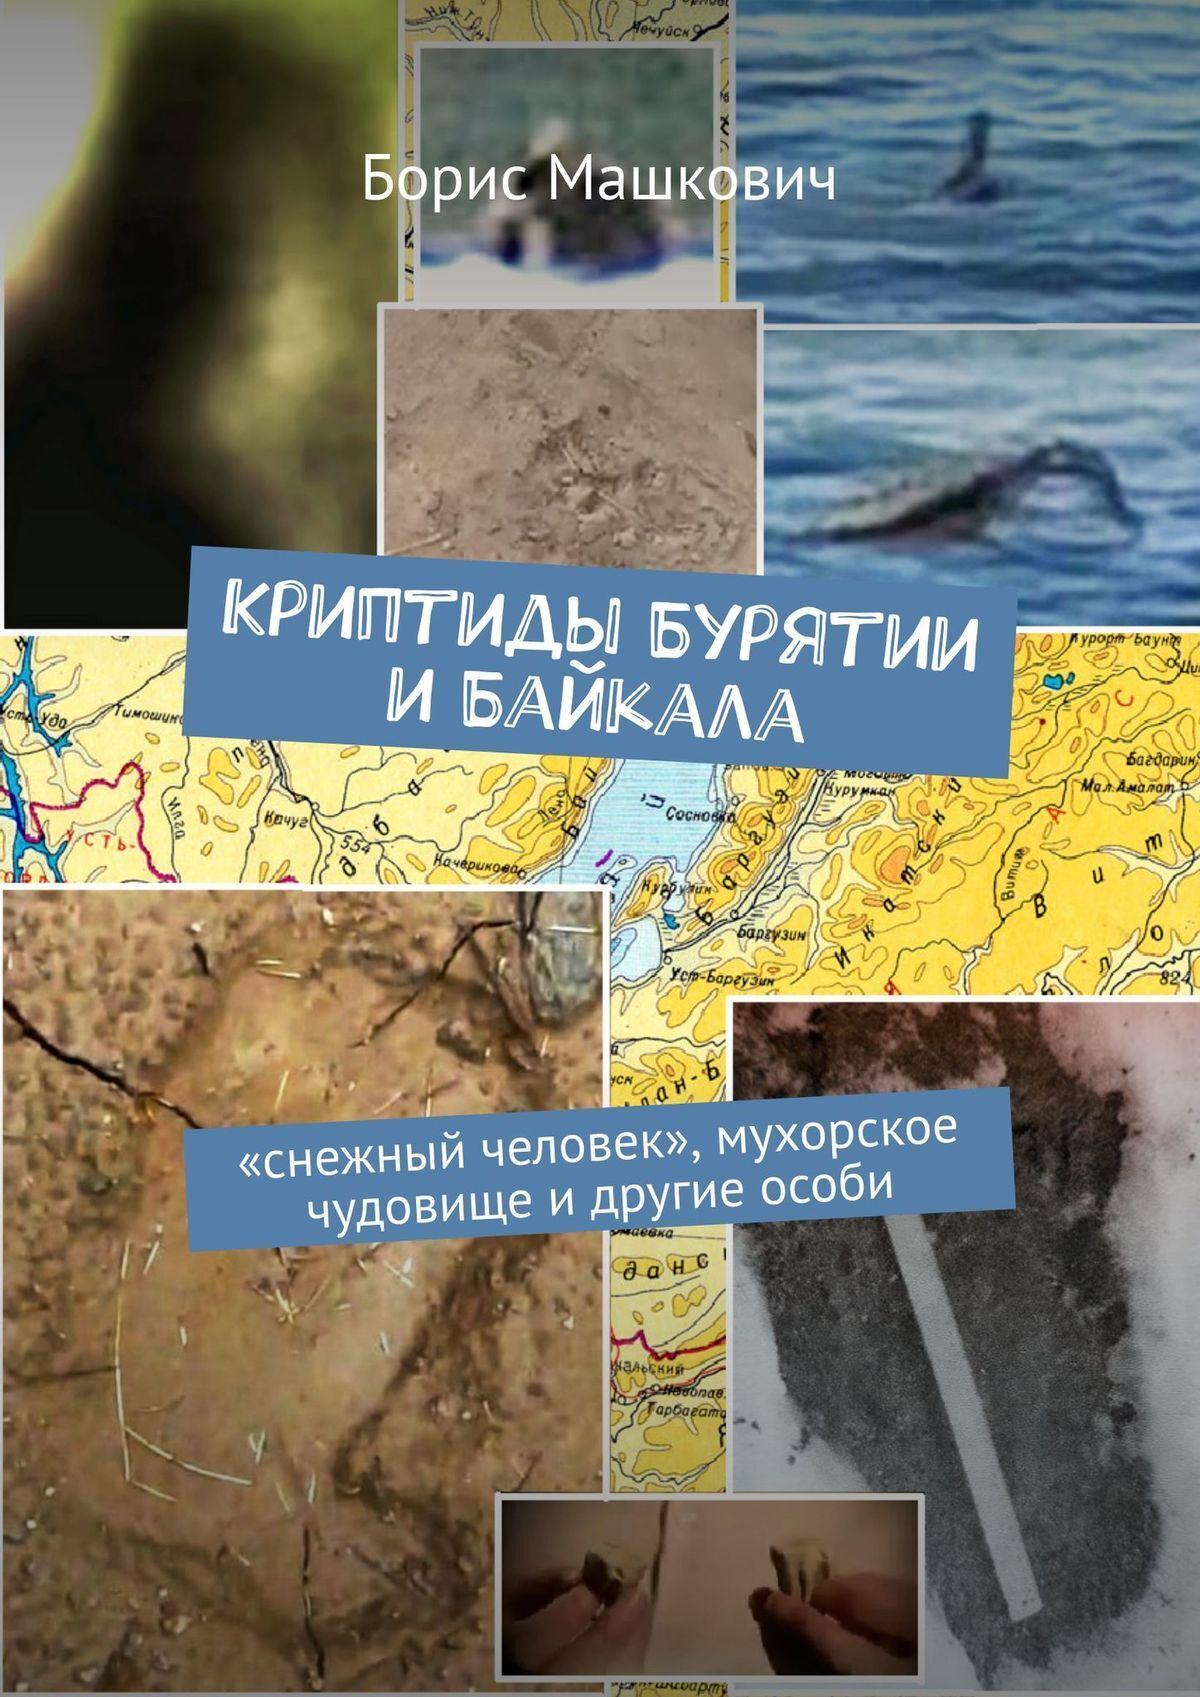 Купить книгу Криптиды Бурятии иБайкала, автора Бориса Машковича